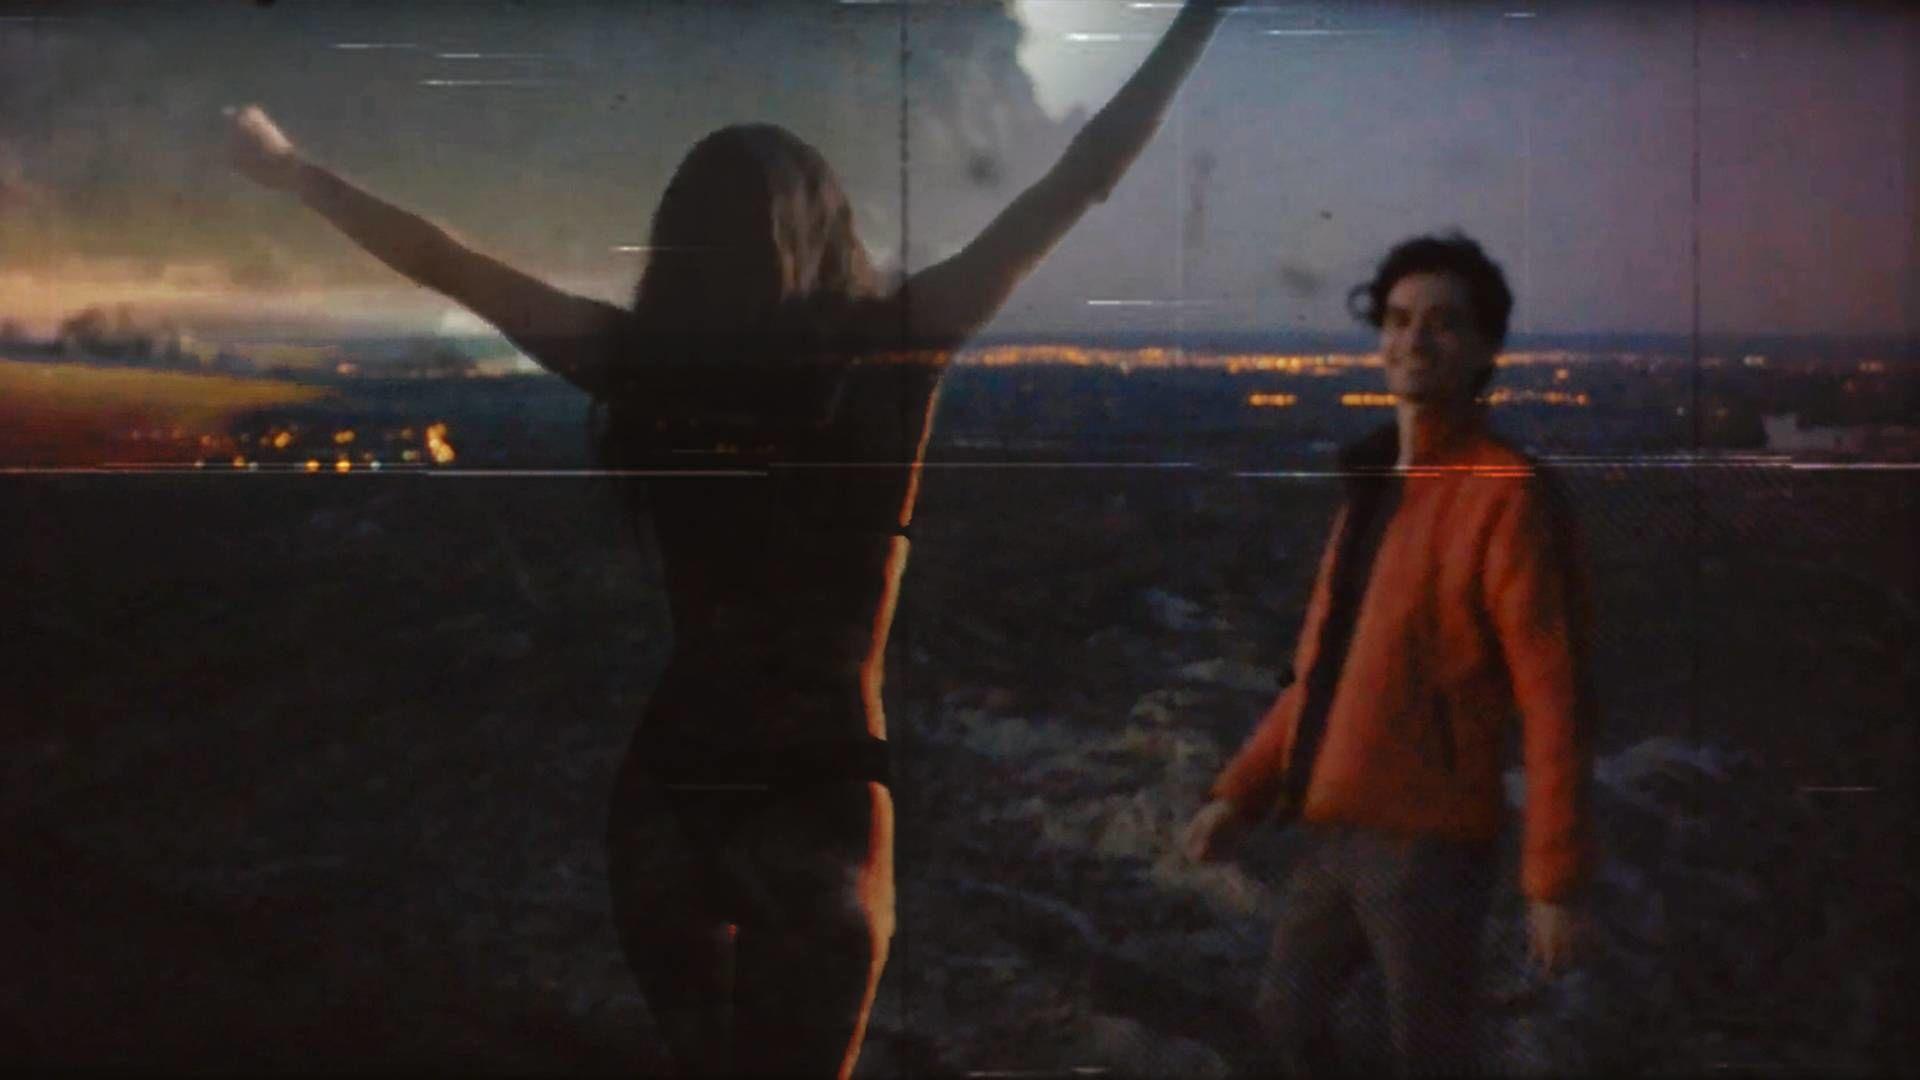 Misty Memories (Lyrics Video)